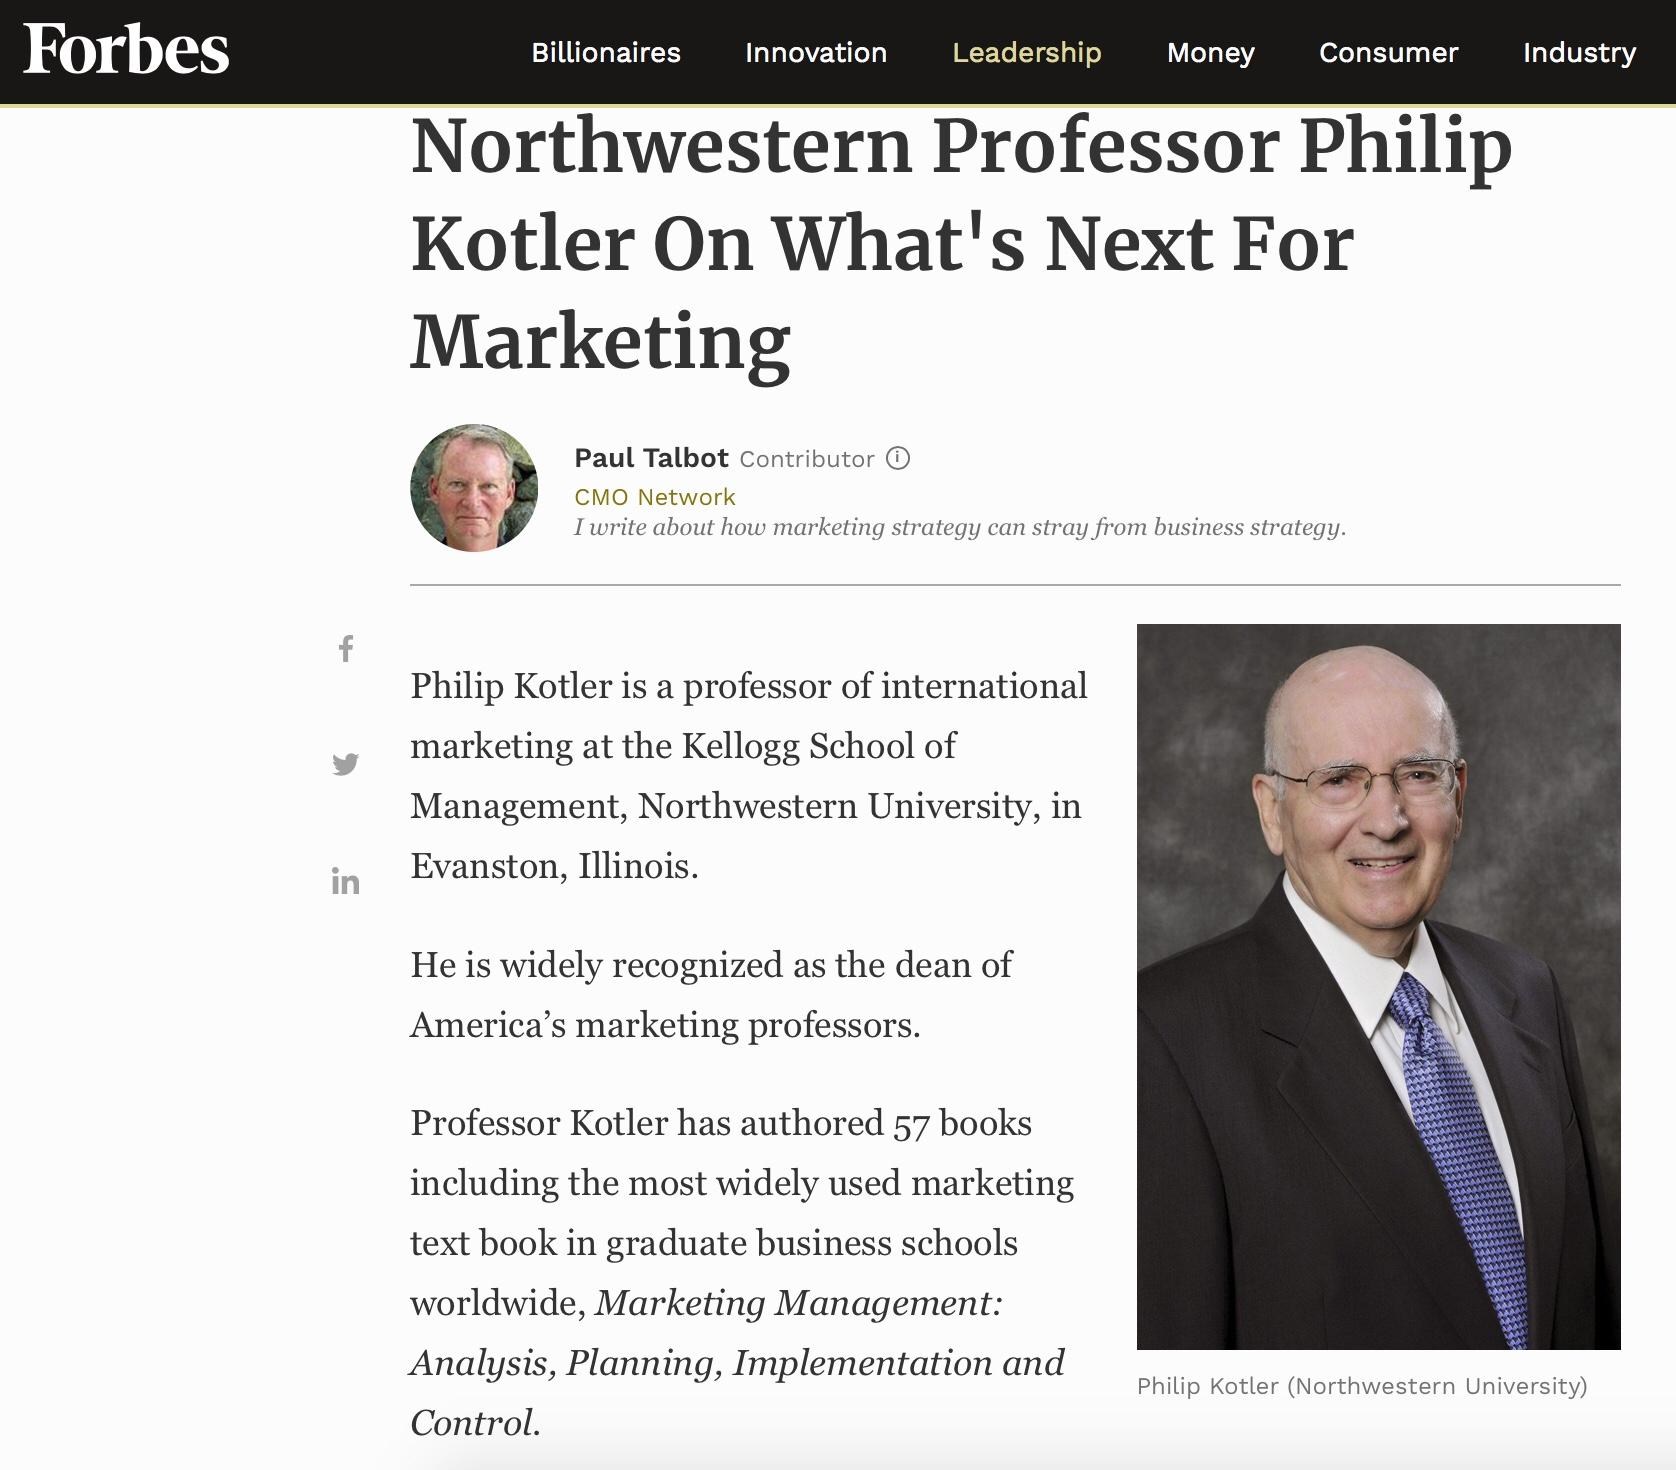 Philip Kotler (Northwestern University) What's Next For Marketing